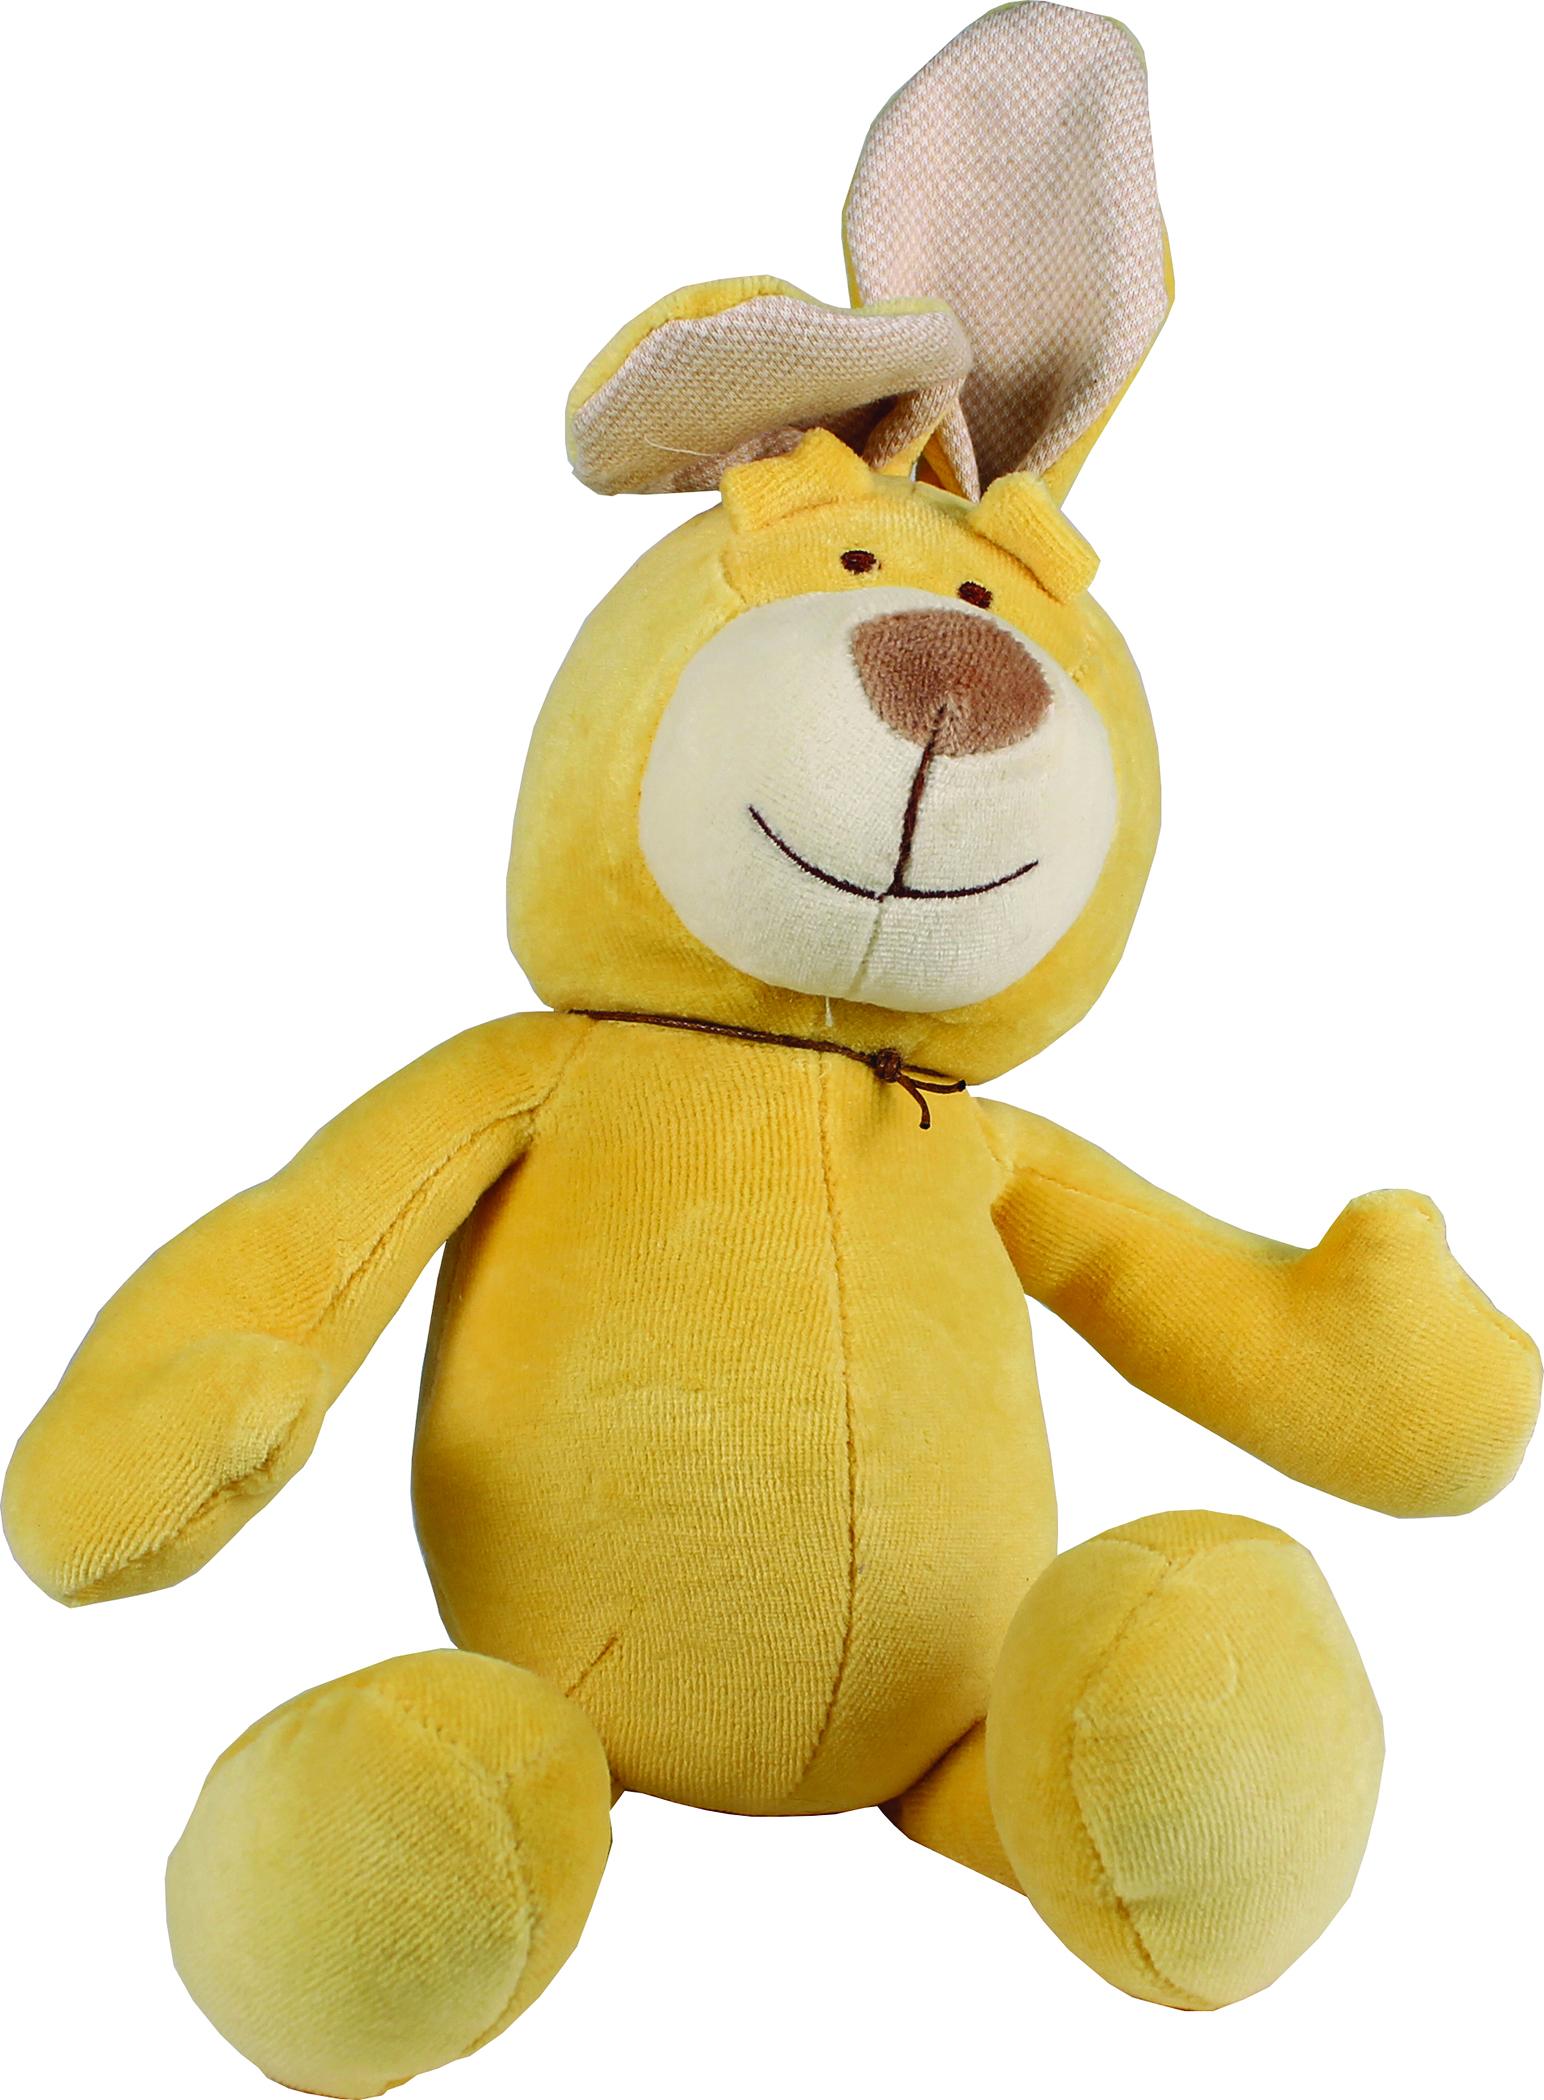 Simply Fido Brooklyn Design Lucy Bunny Squeaker Plush Dog Toy